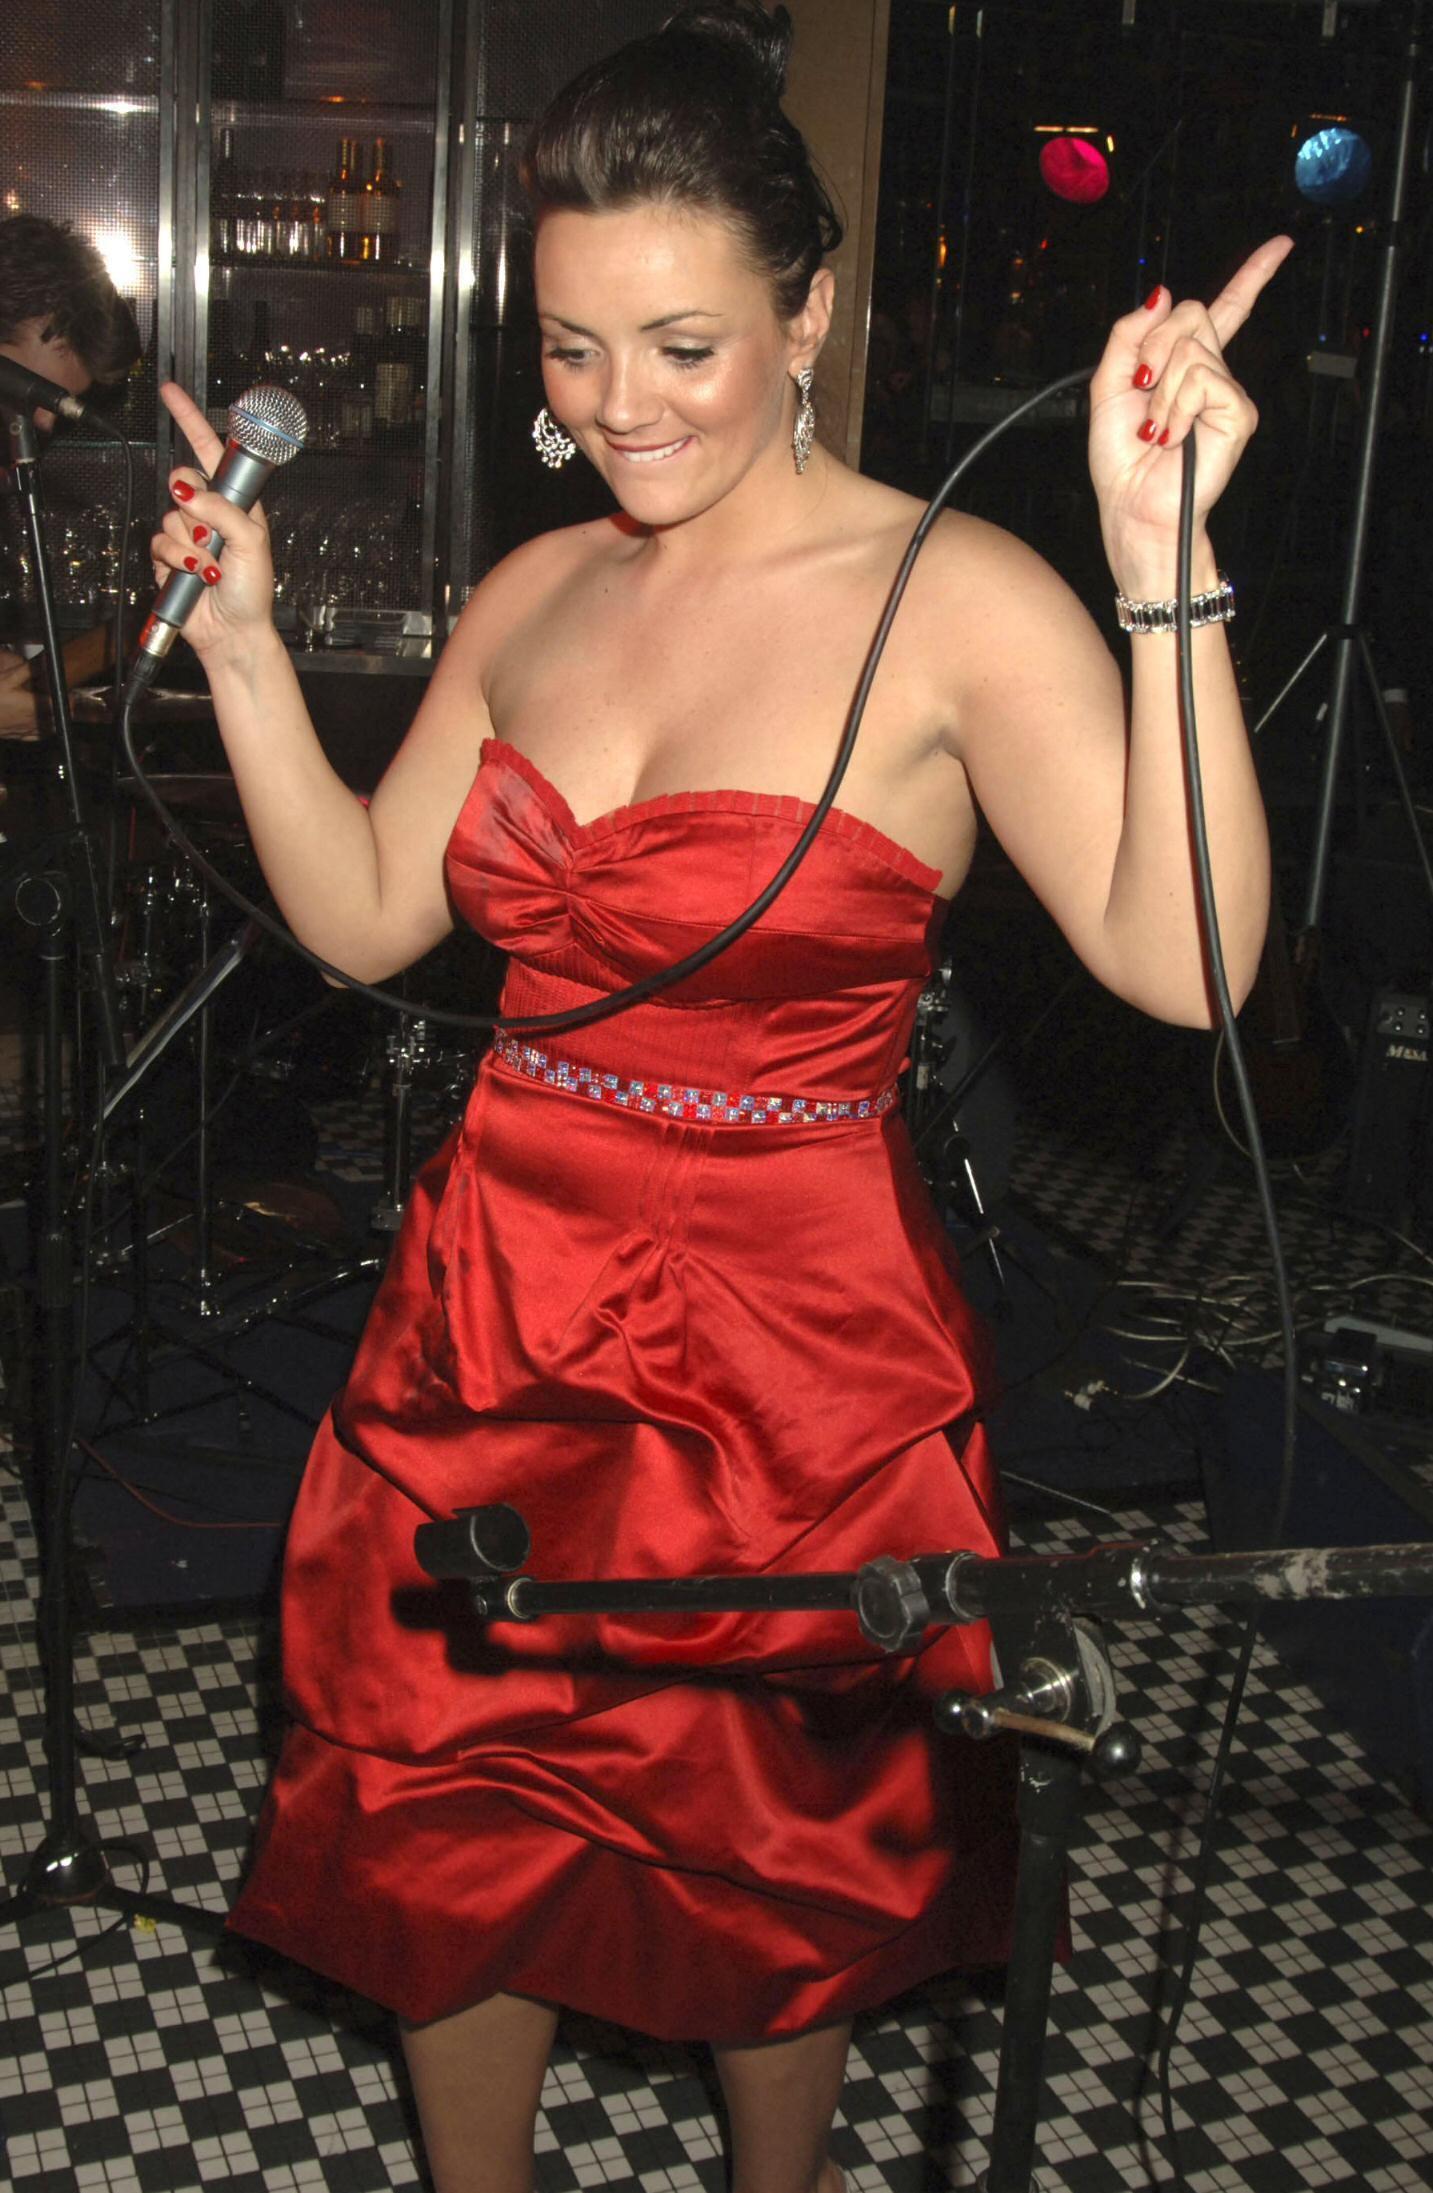 Judah Katz,Roxy Saint Hot video Marilyn Martinez,Felicity Waterman